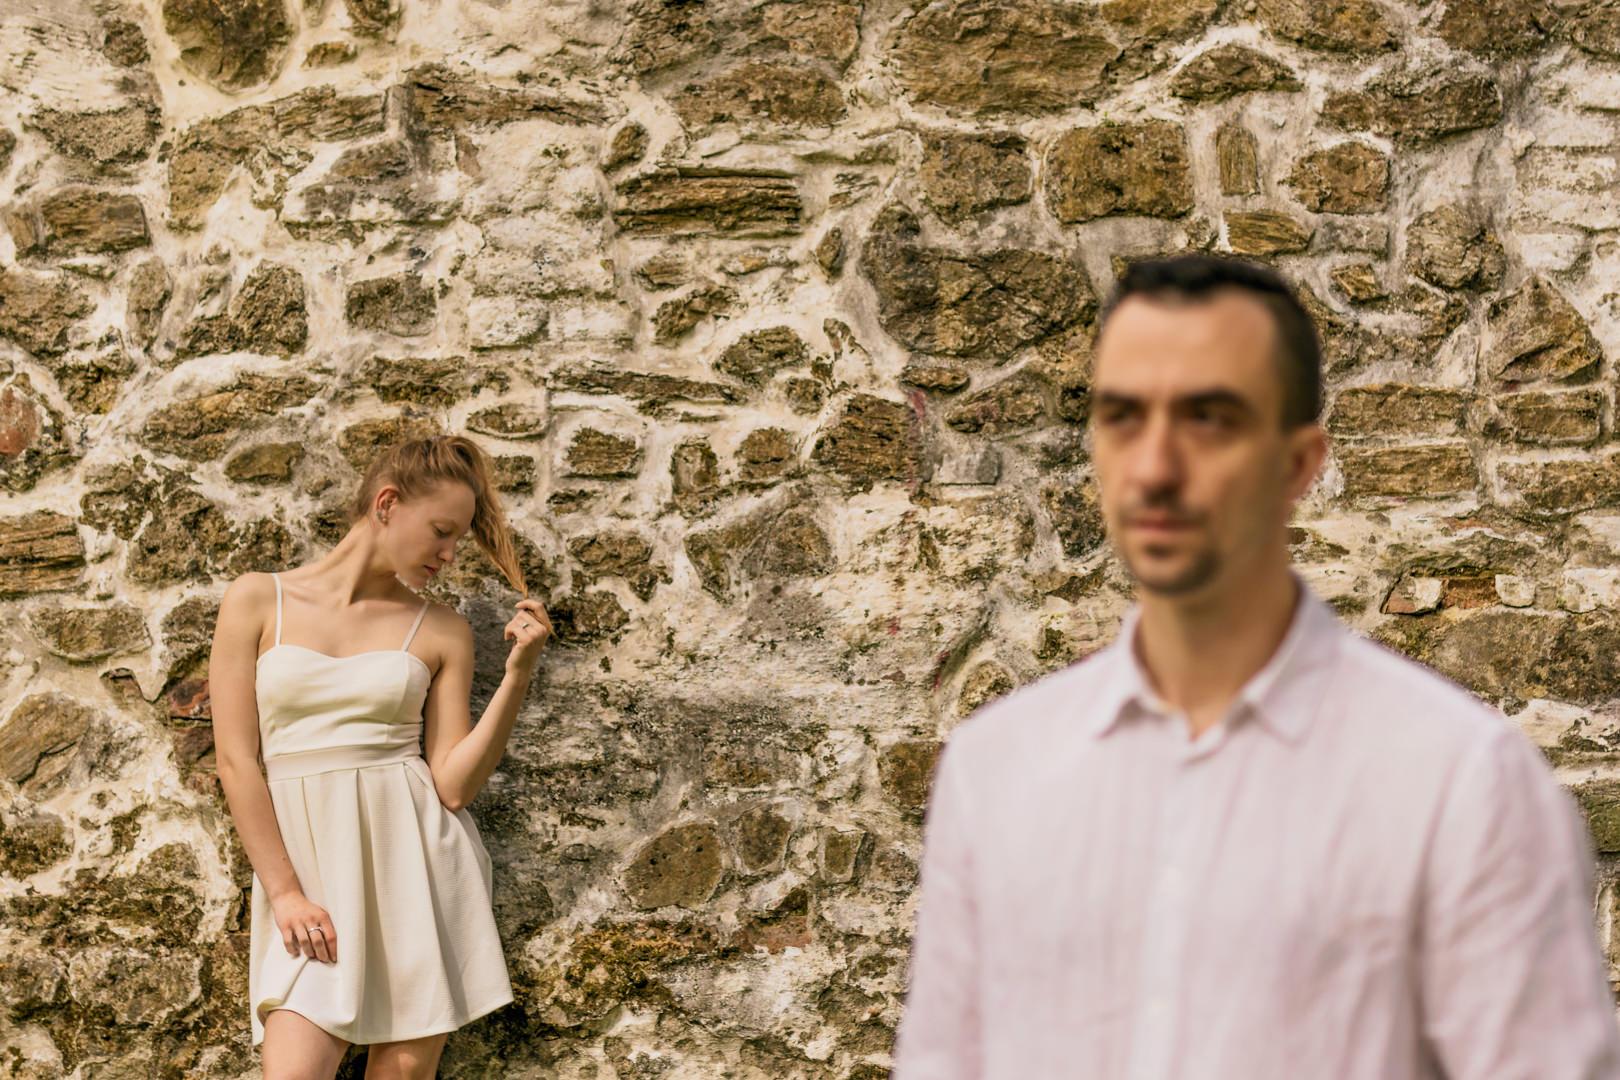 robert kale weddings ljubavna priča fotograf vjenčanja zagreb